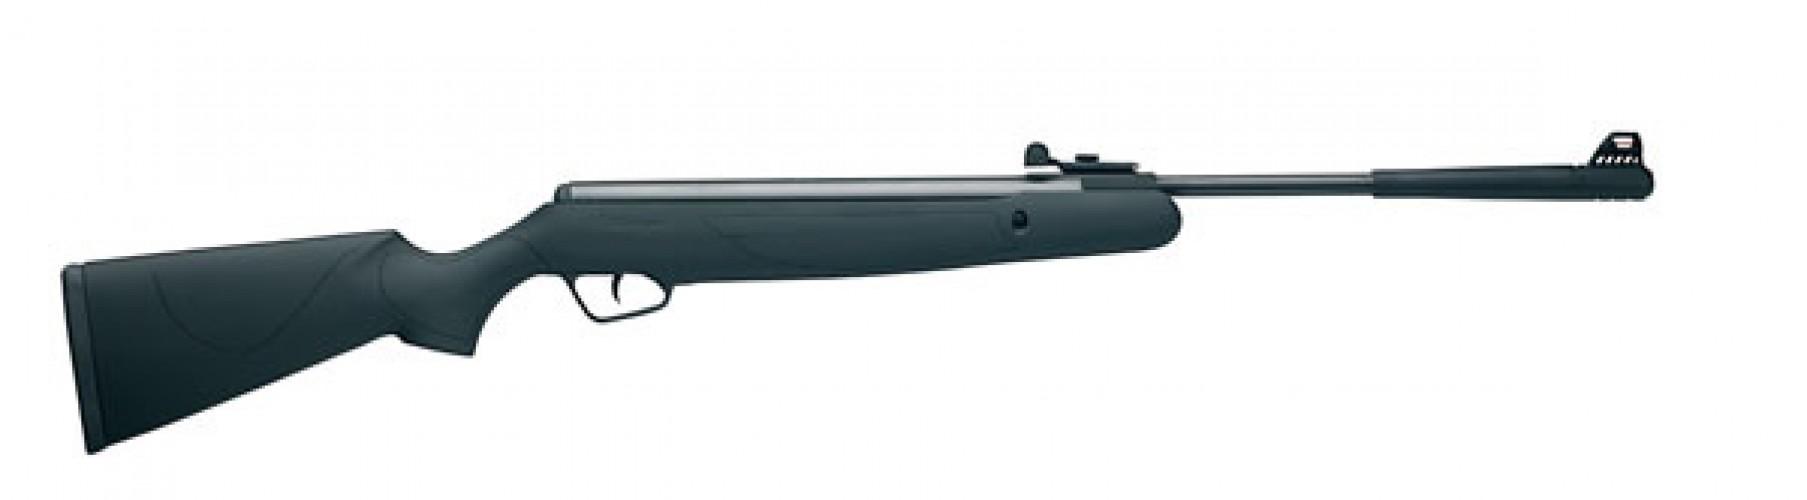 Пневматическая винтовка Stoeger х10 Synthetic 4,5 мм